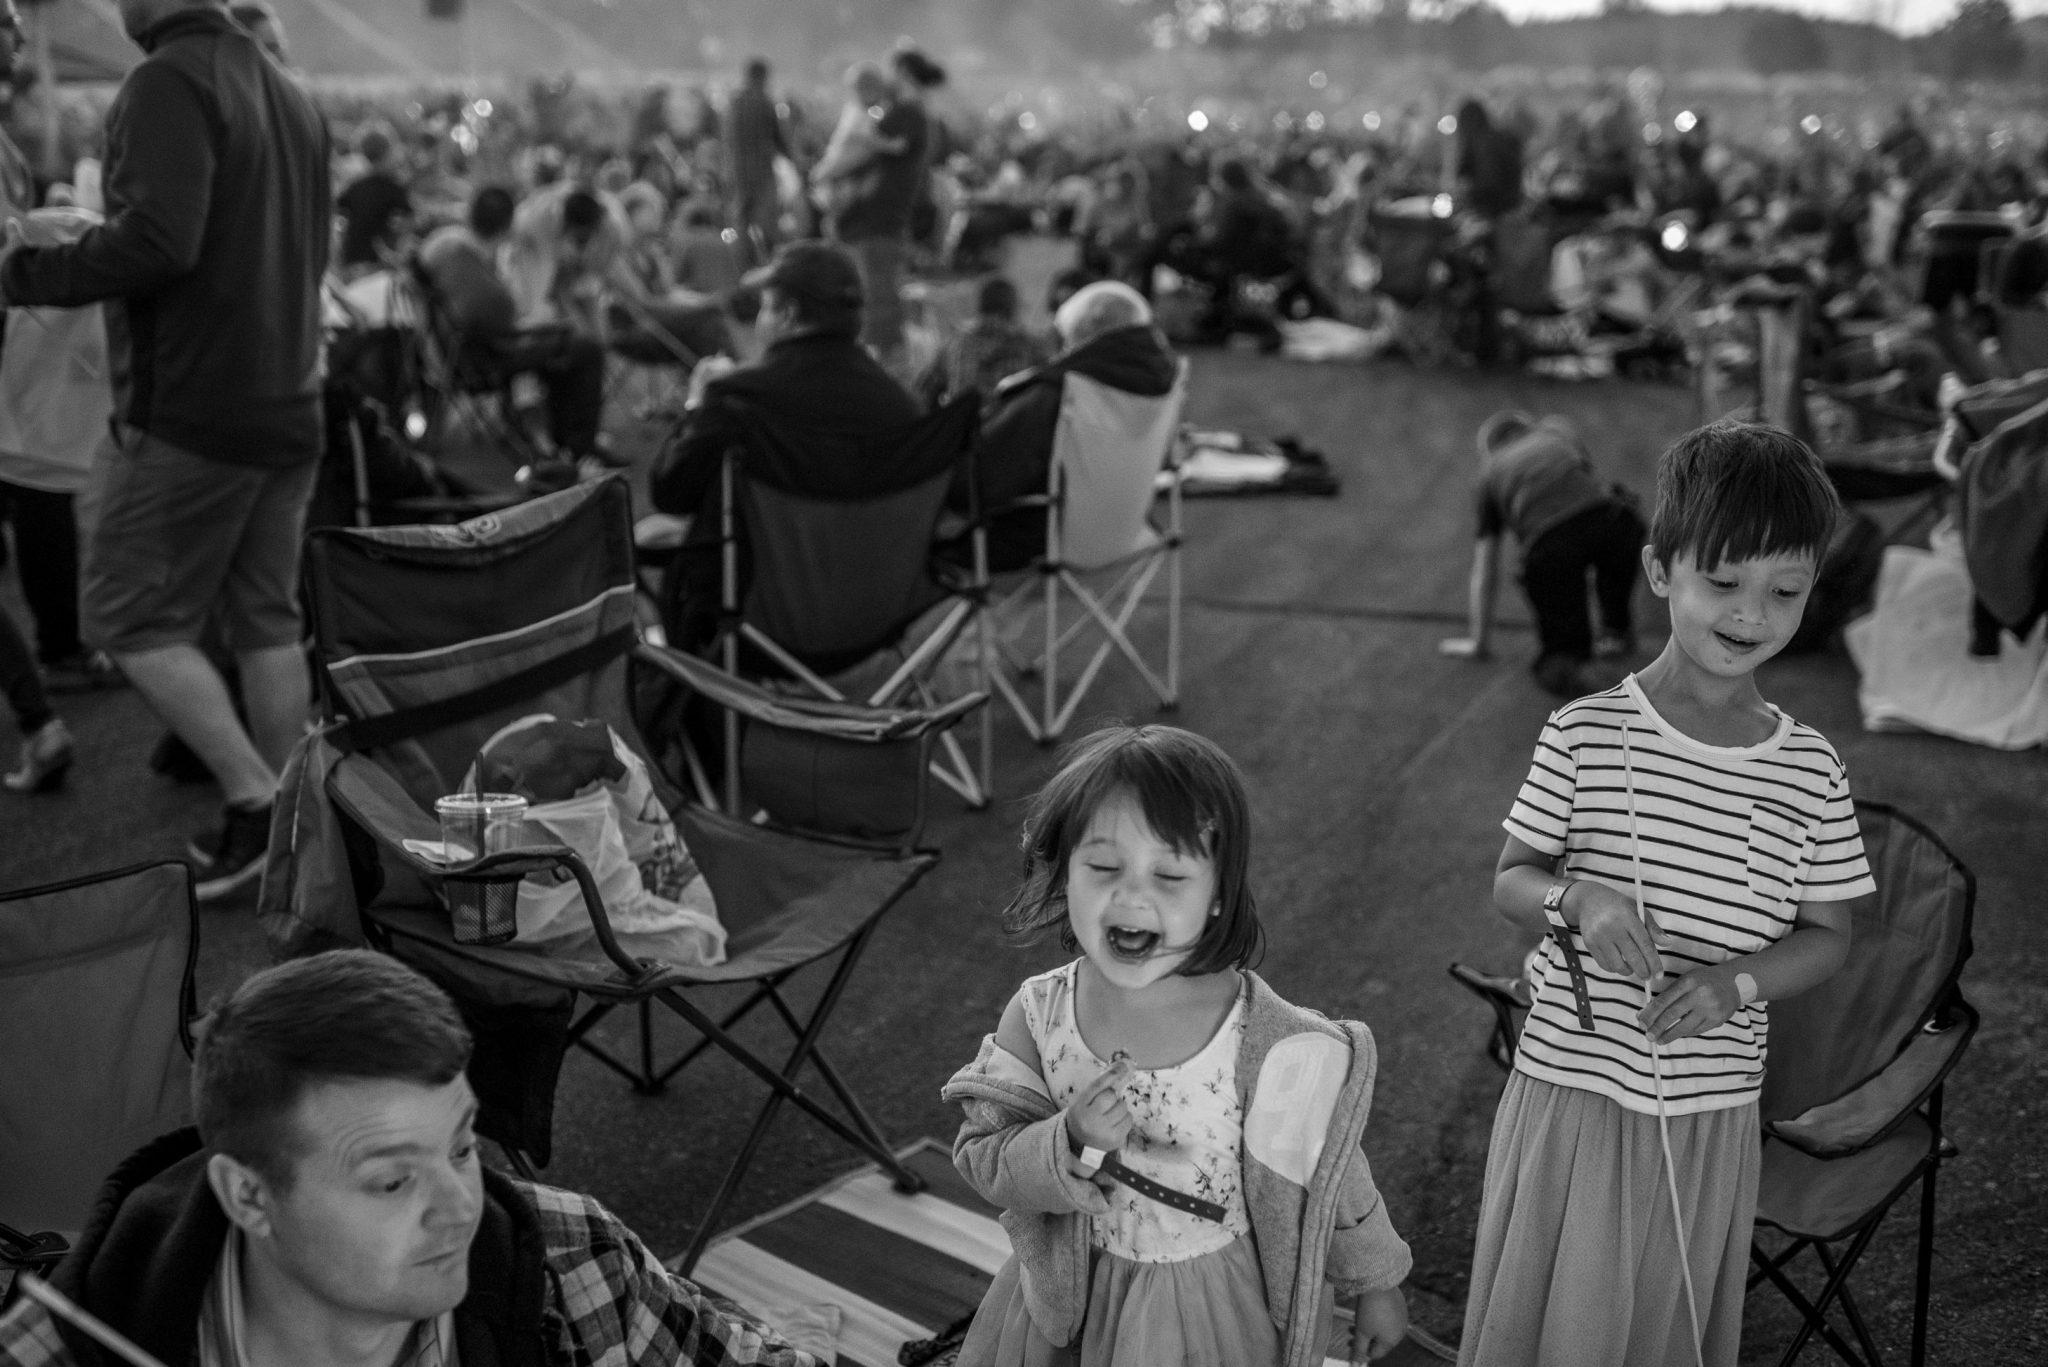 Lantern Fest, Smores, and Carls Jr | Spokane Photographer | June 5-on-5